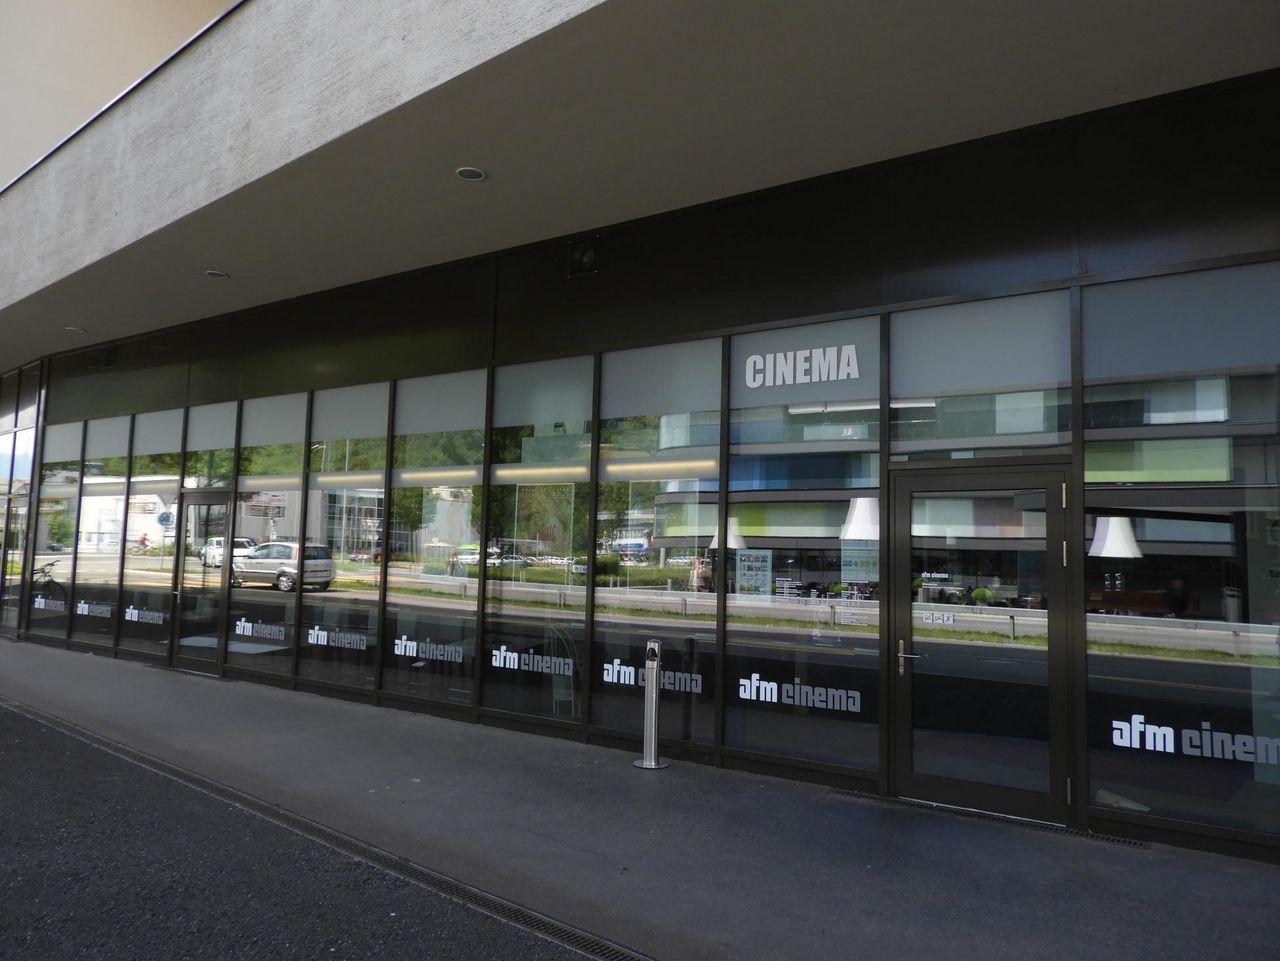 Cinepark Stans